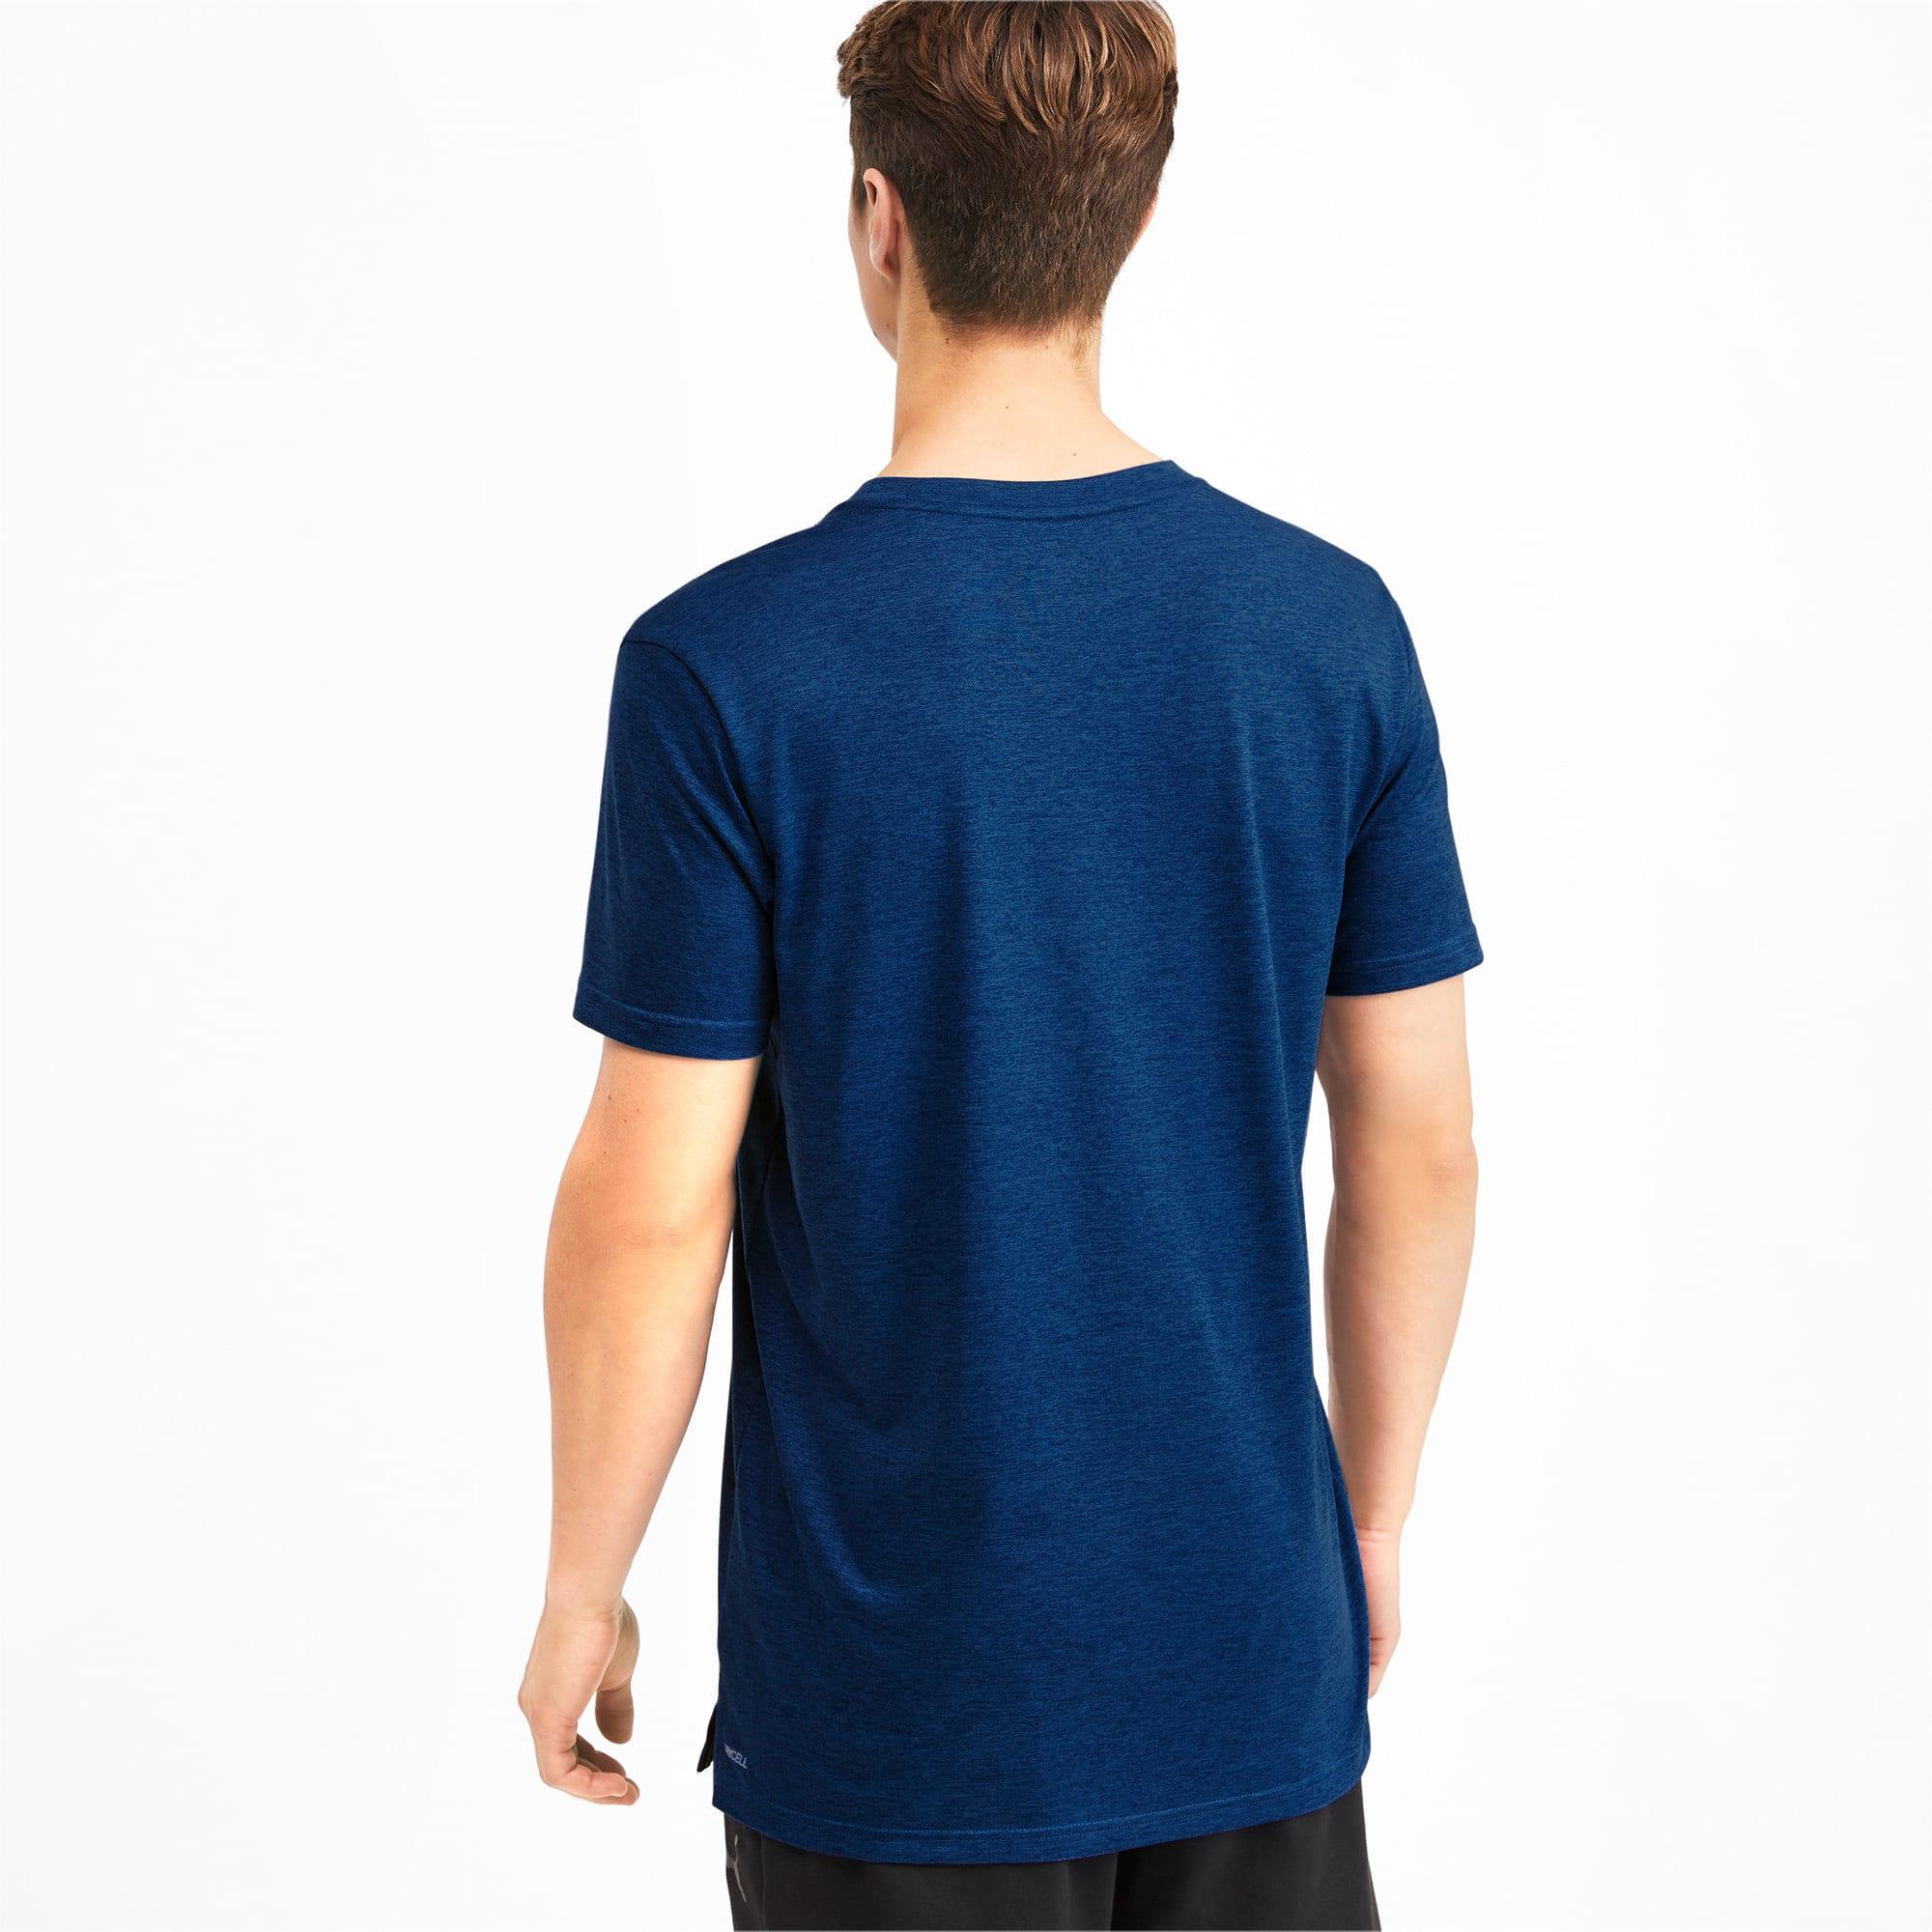 Thumbnail 2 of Heather Cat Herren Training T-Shirt, Galaxy Blue Heather, medium